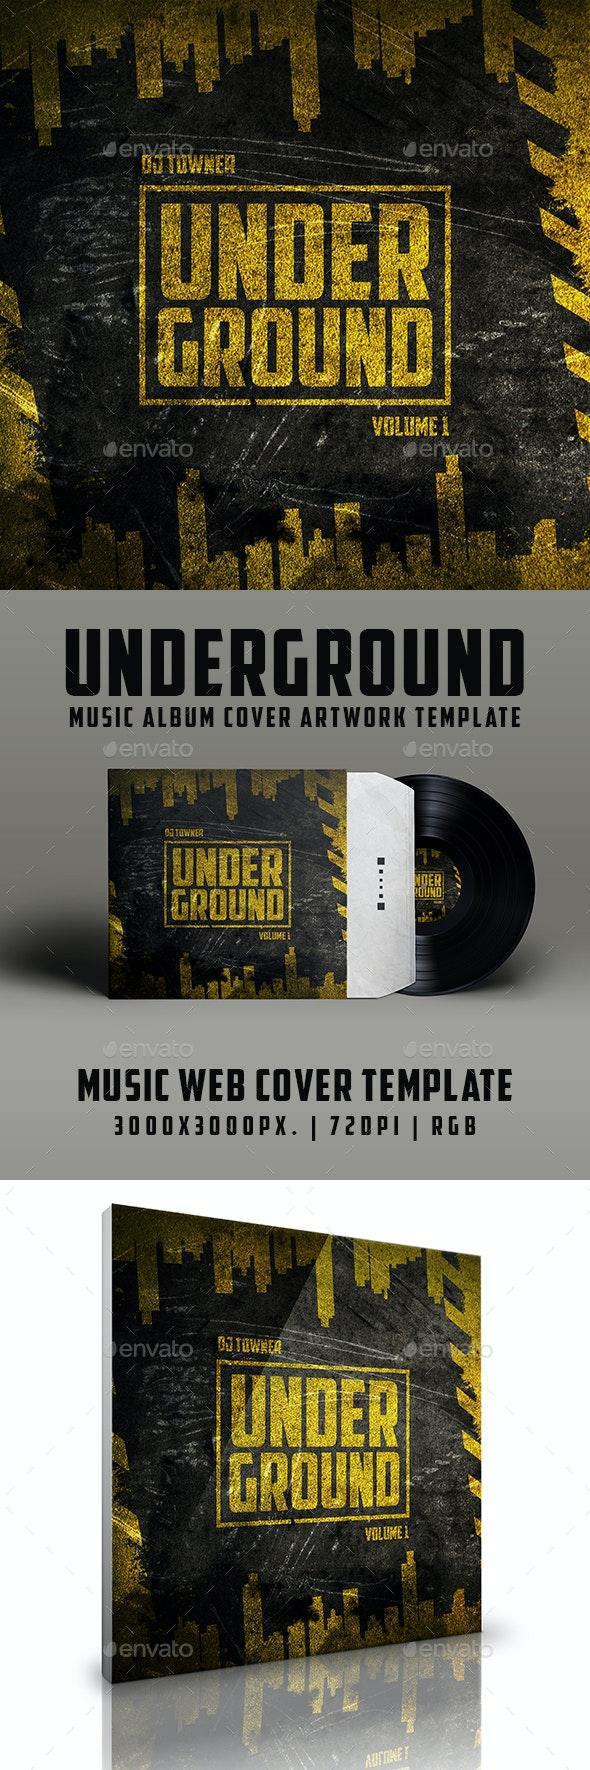 Underground Music Album Urban Grunge Cover Artwork Template - Miscellaneous Social Media